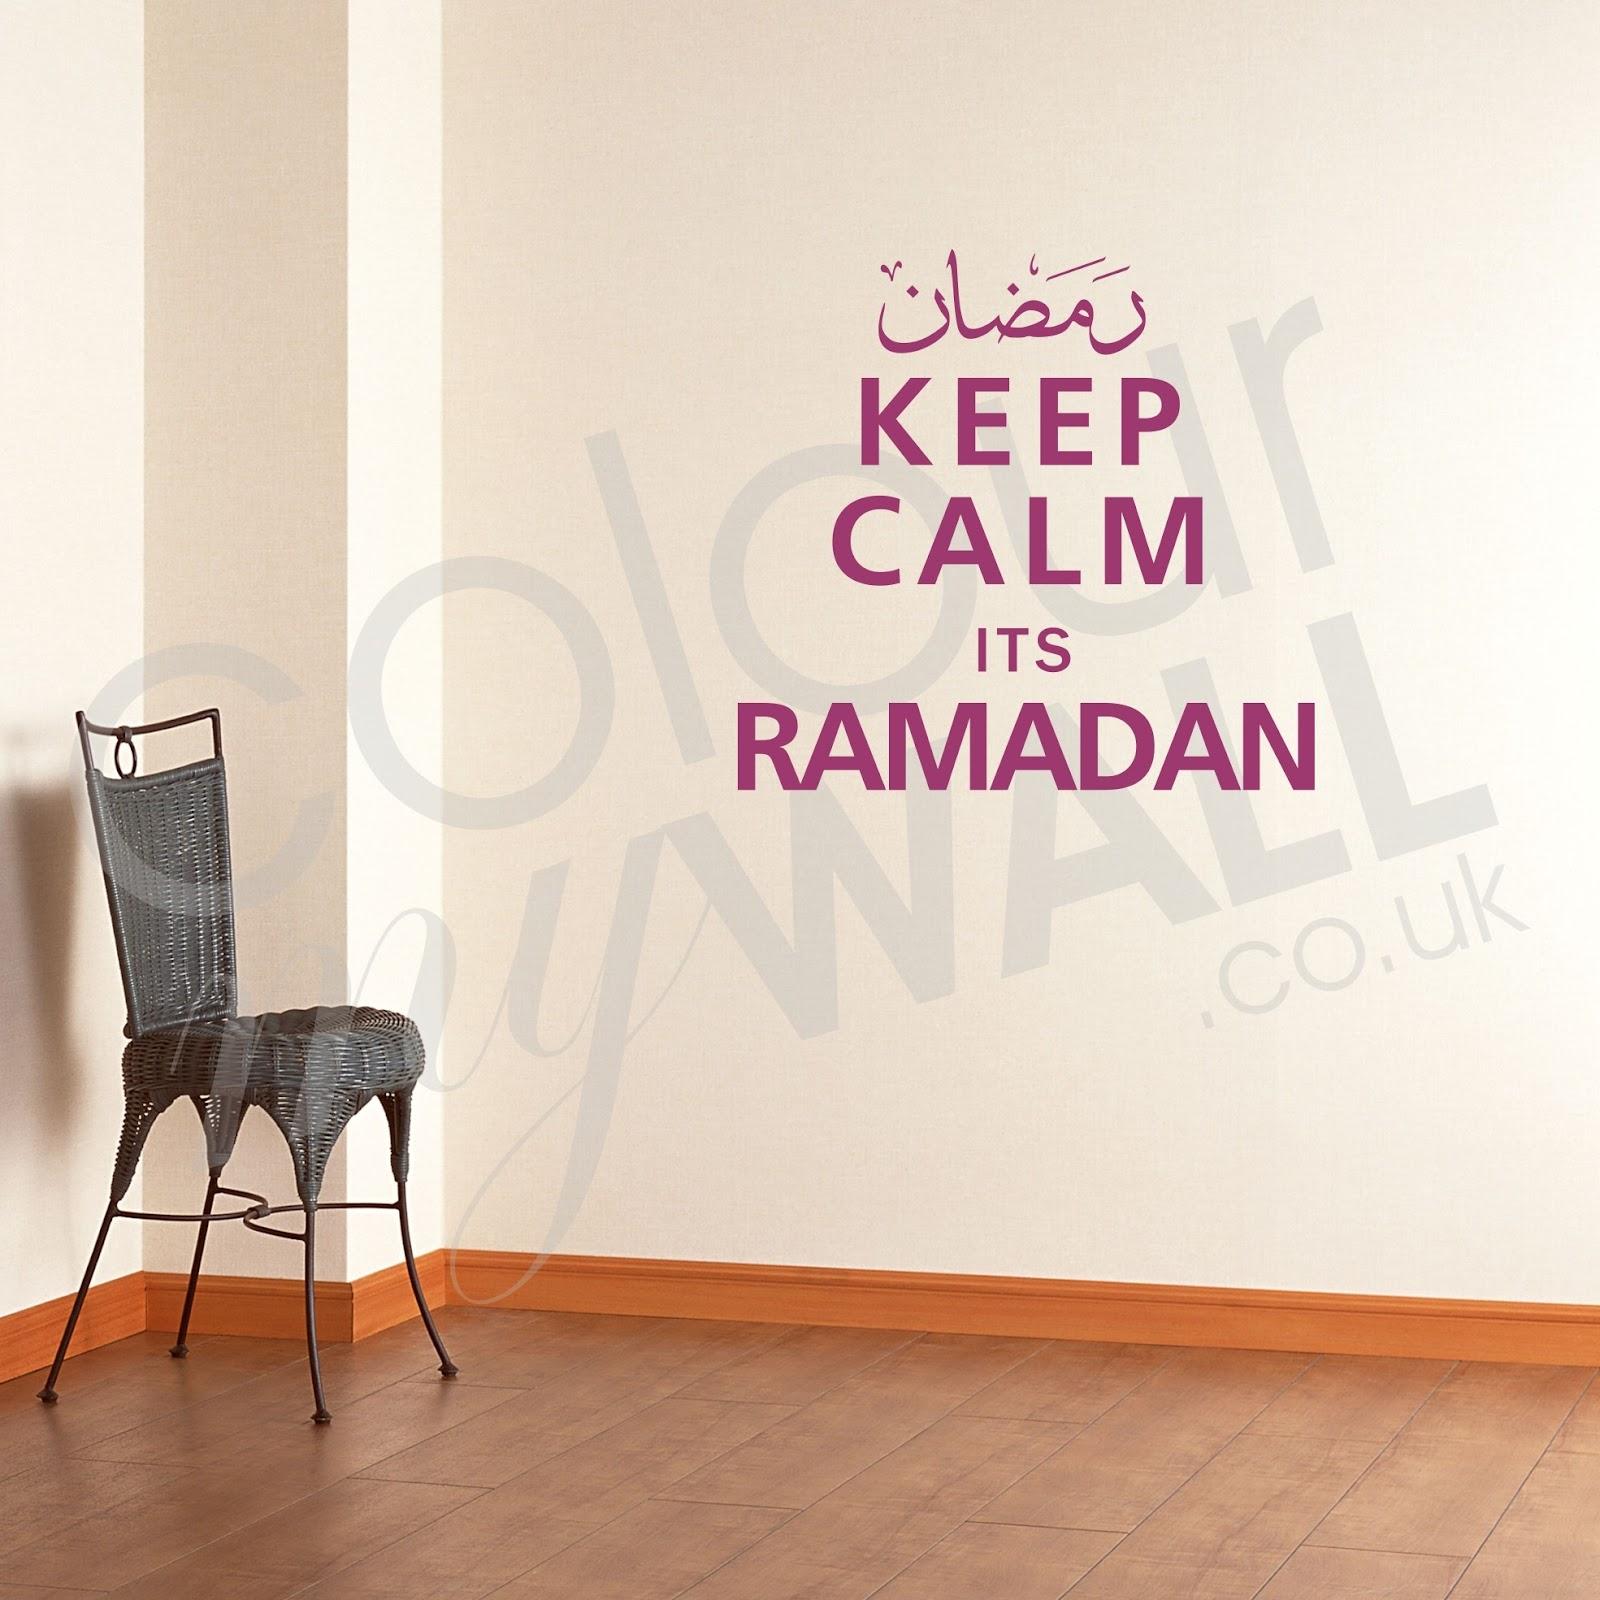 http://2.bp.blogspot.com/-KJmLGwYGlyU/UAqhv7ez7TI/AAAAAAAABgc/dWXp3u9VdBk/s1600/ramadhan05.jpg